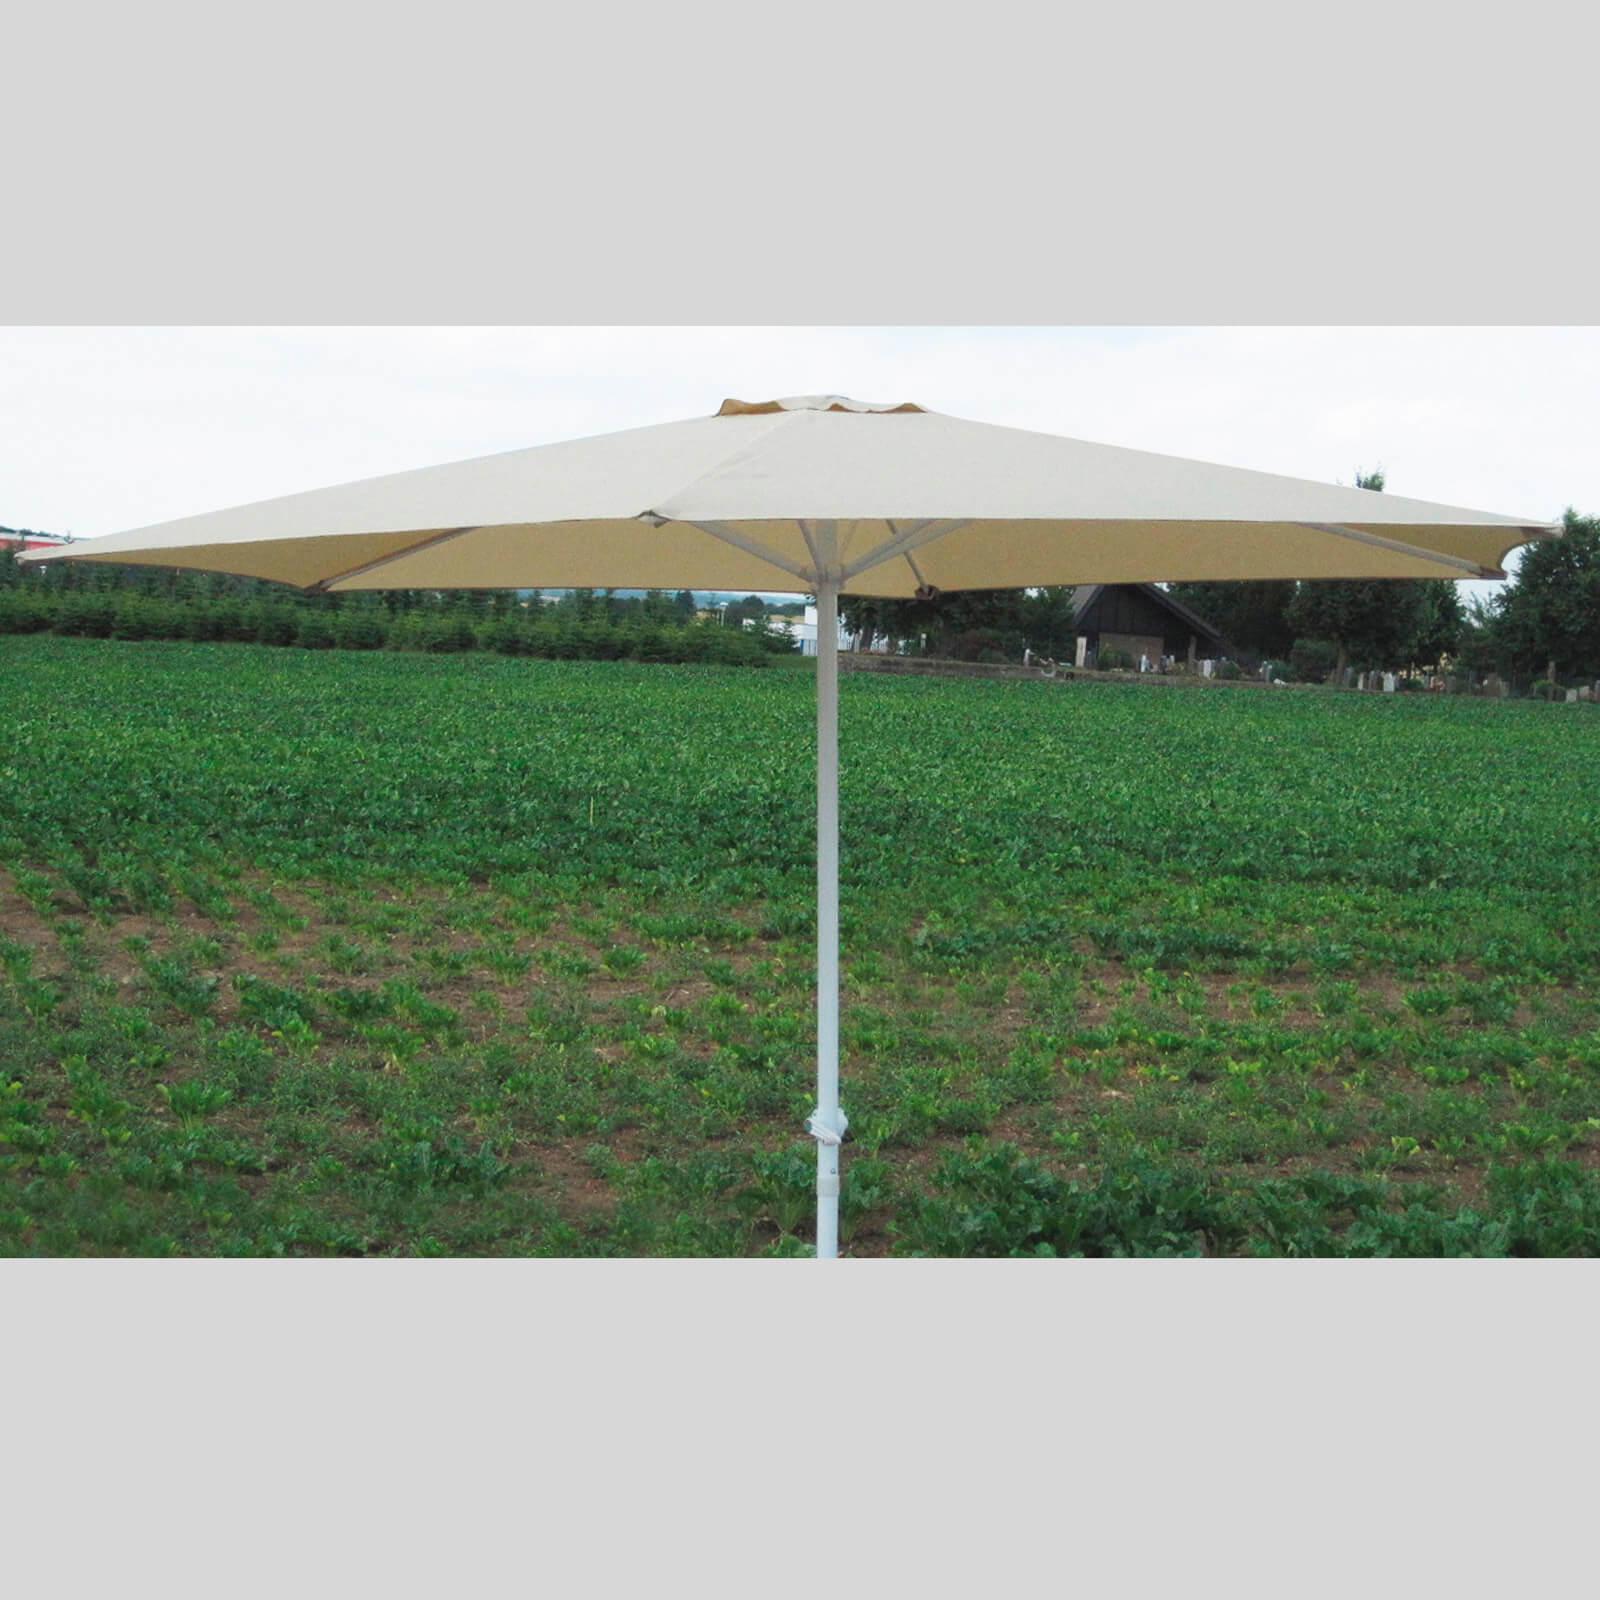 Dema Marktschirm Sonnenschirm 300 cm beige Kurbel Gartenschirm Schirm Sonnenschutz 41011